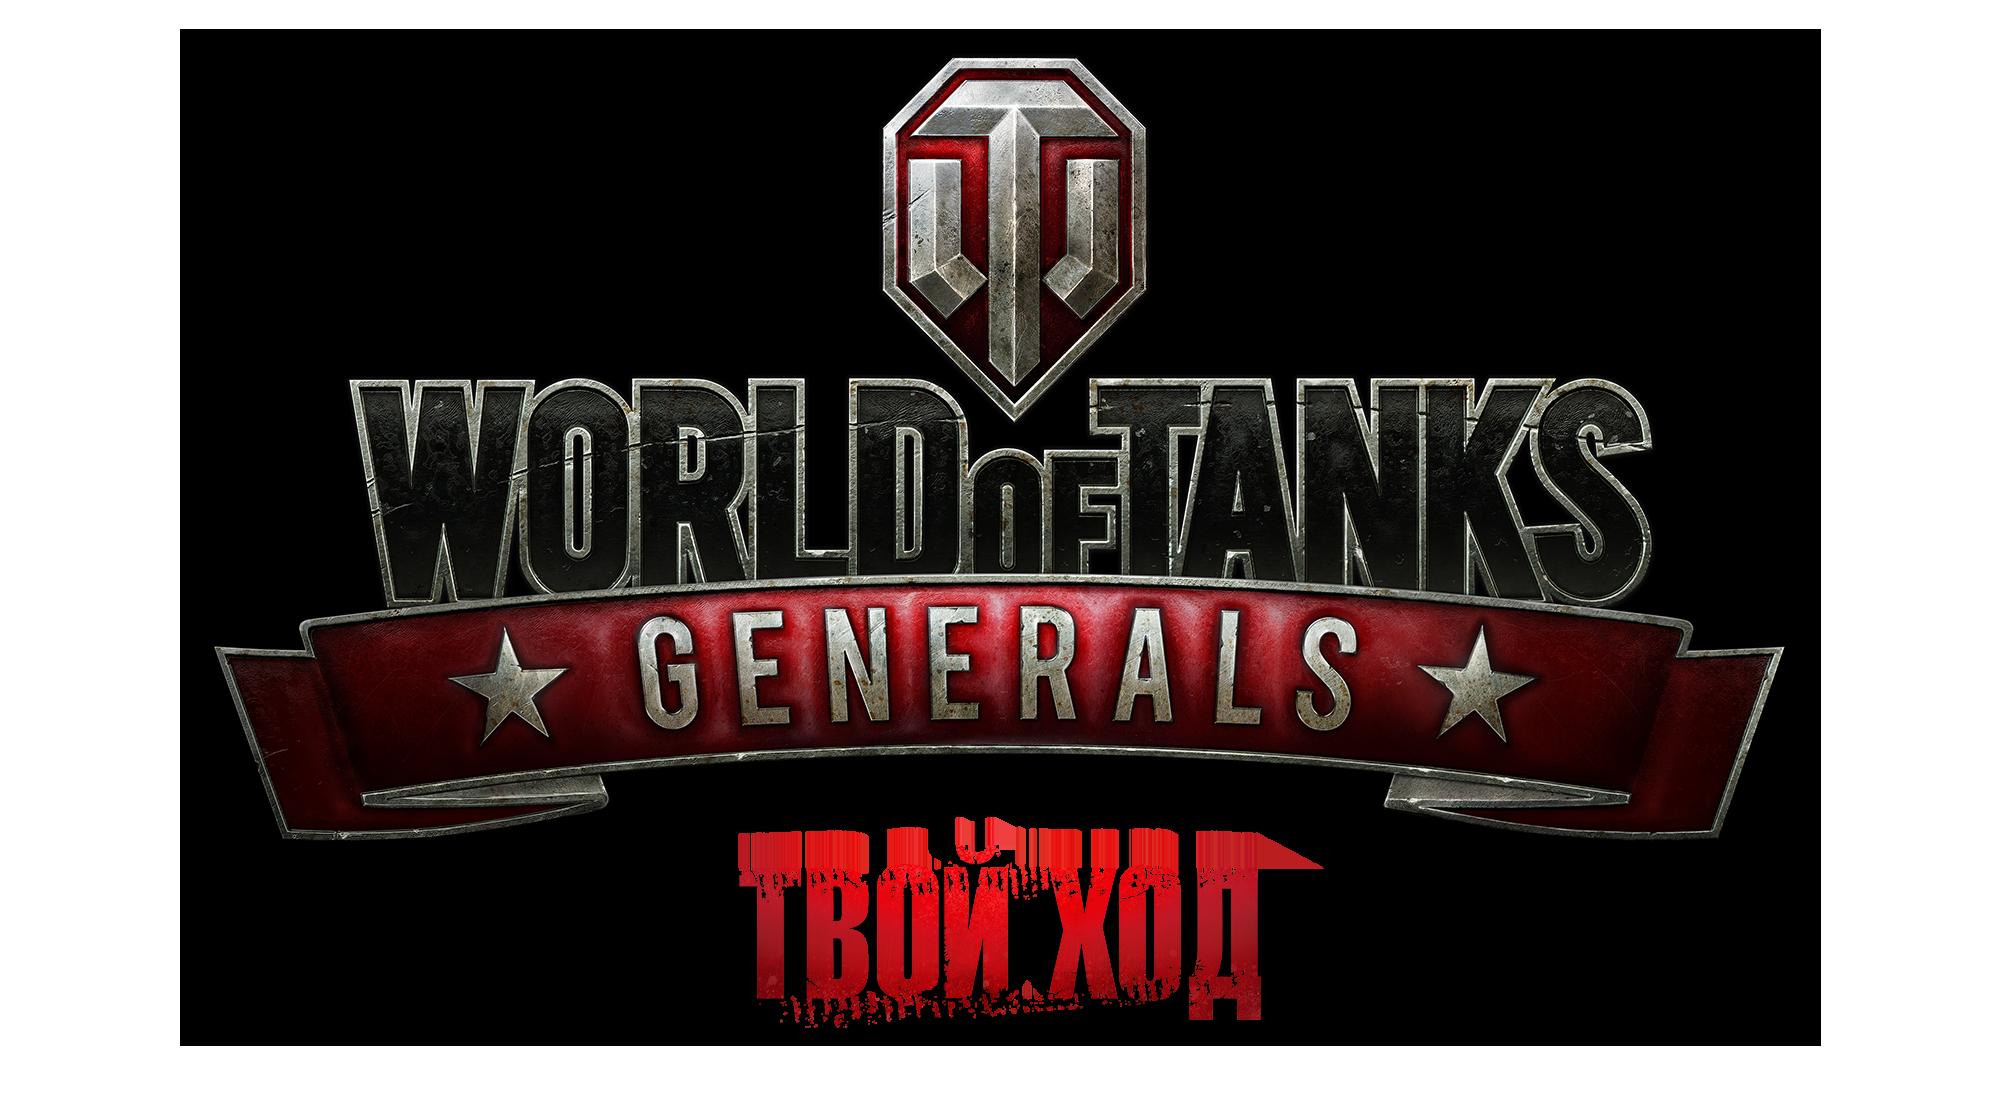 Раздача ключей в бета-версию World of Tanks Generals!. - Изображение 1